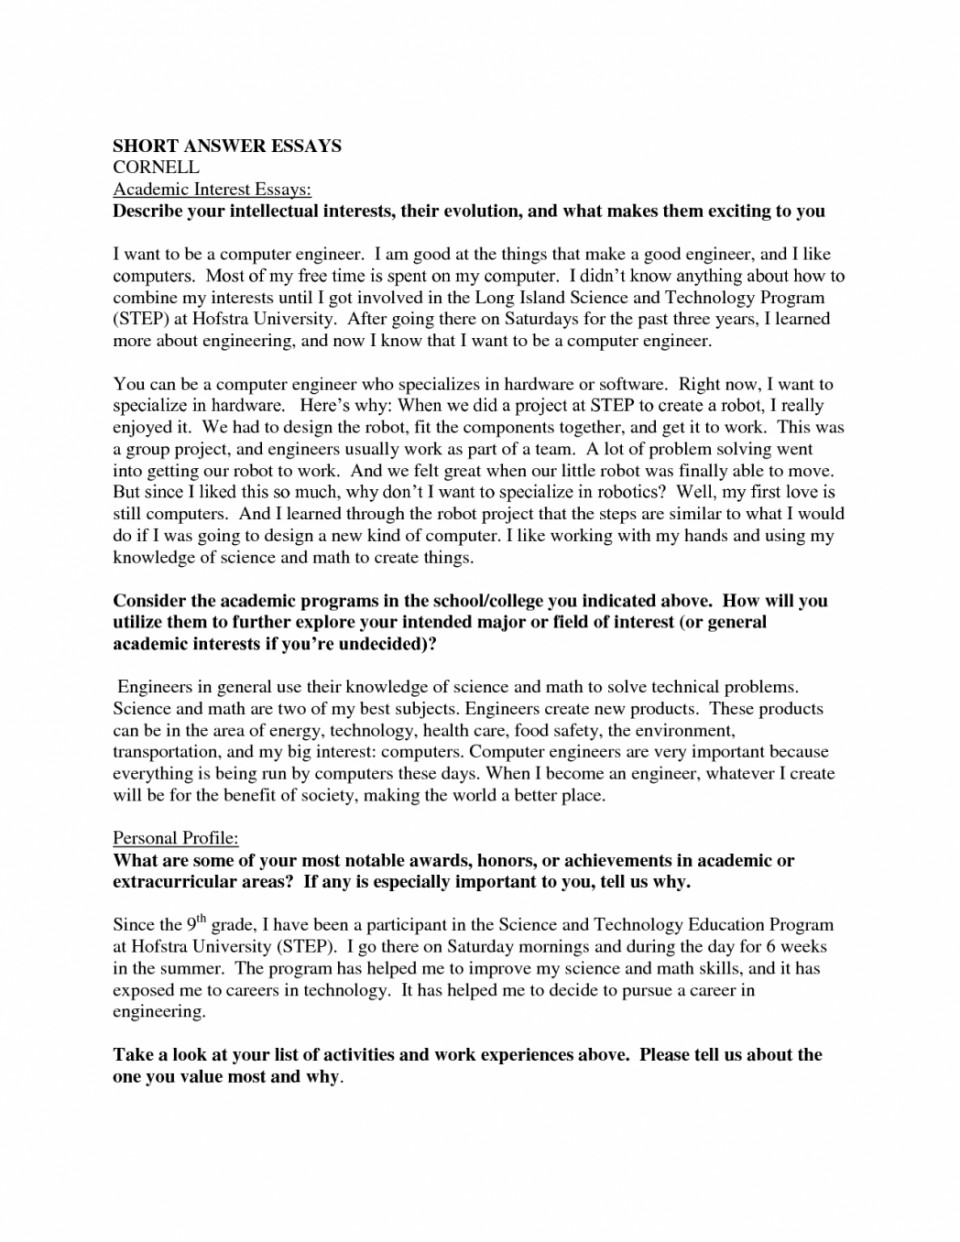 Rainforest Homework Help - buywritecheapessay.com